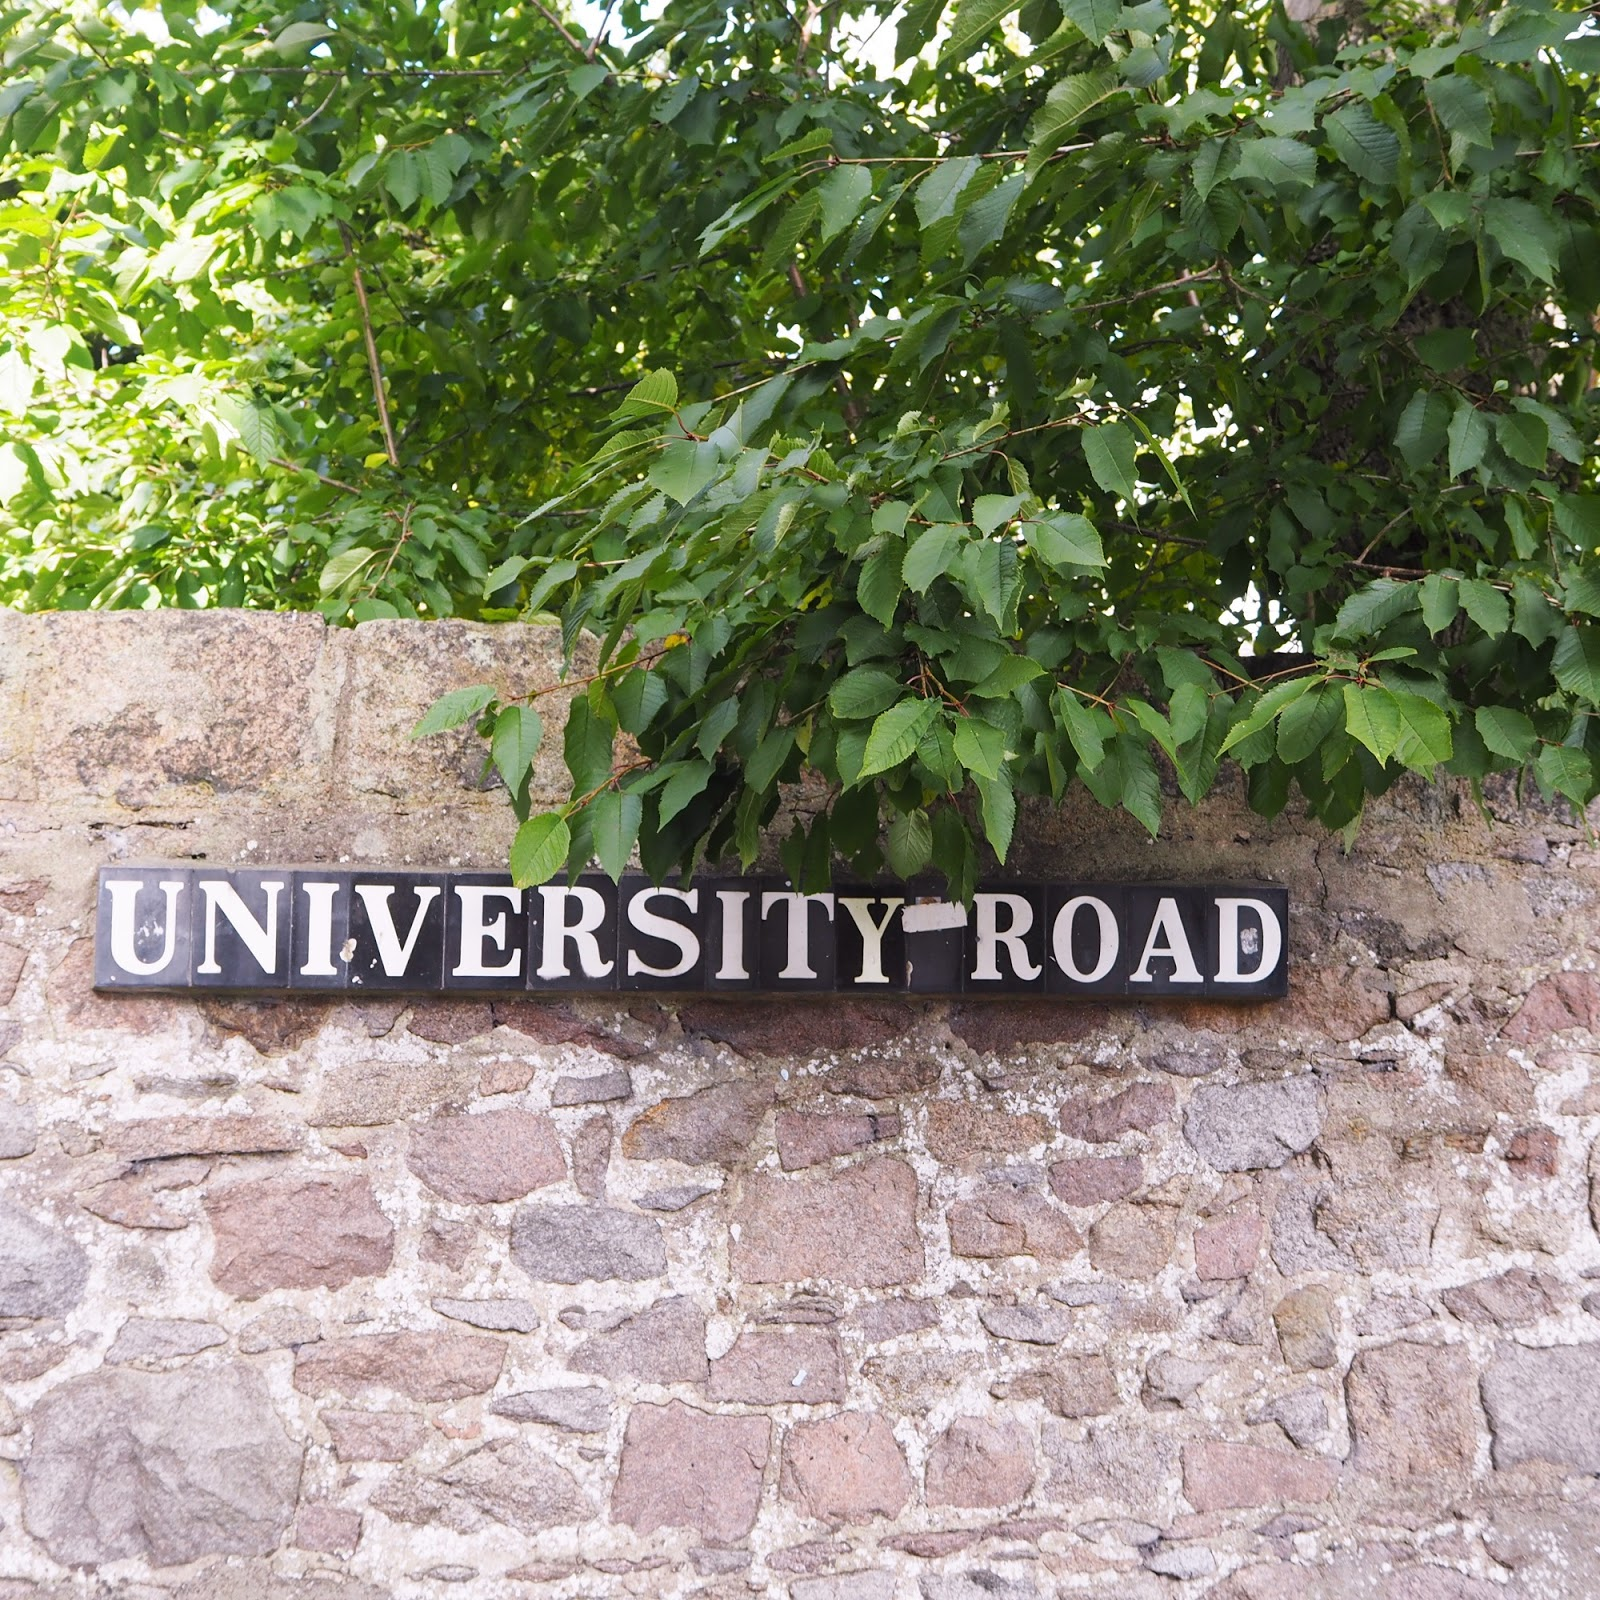 campus of the University of Aberdeen, Aberdeen blogger